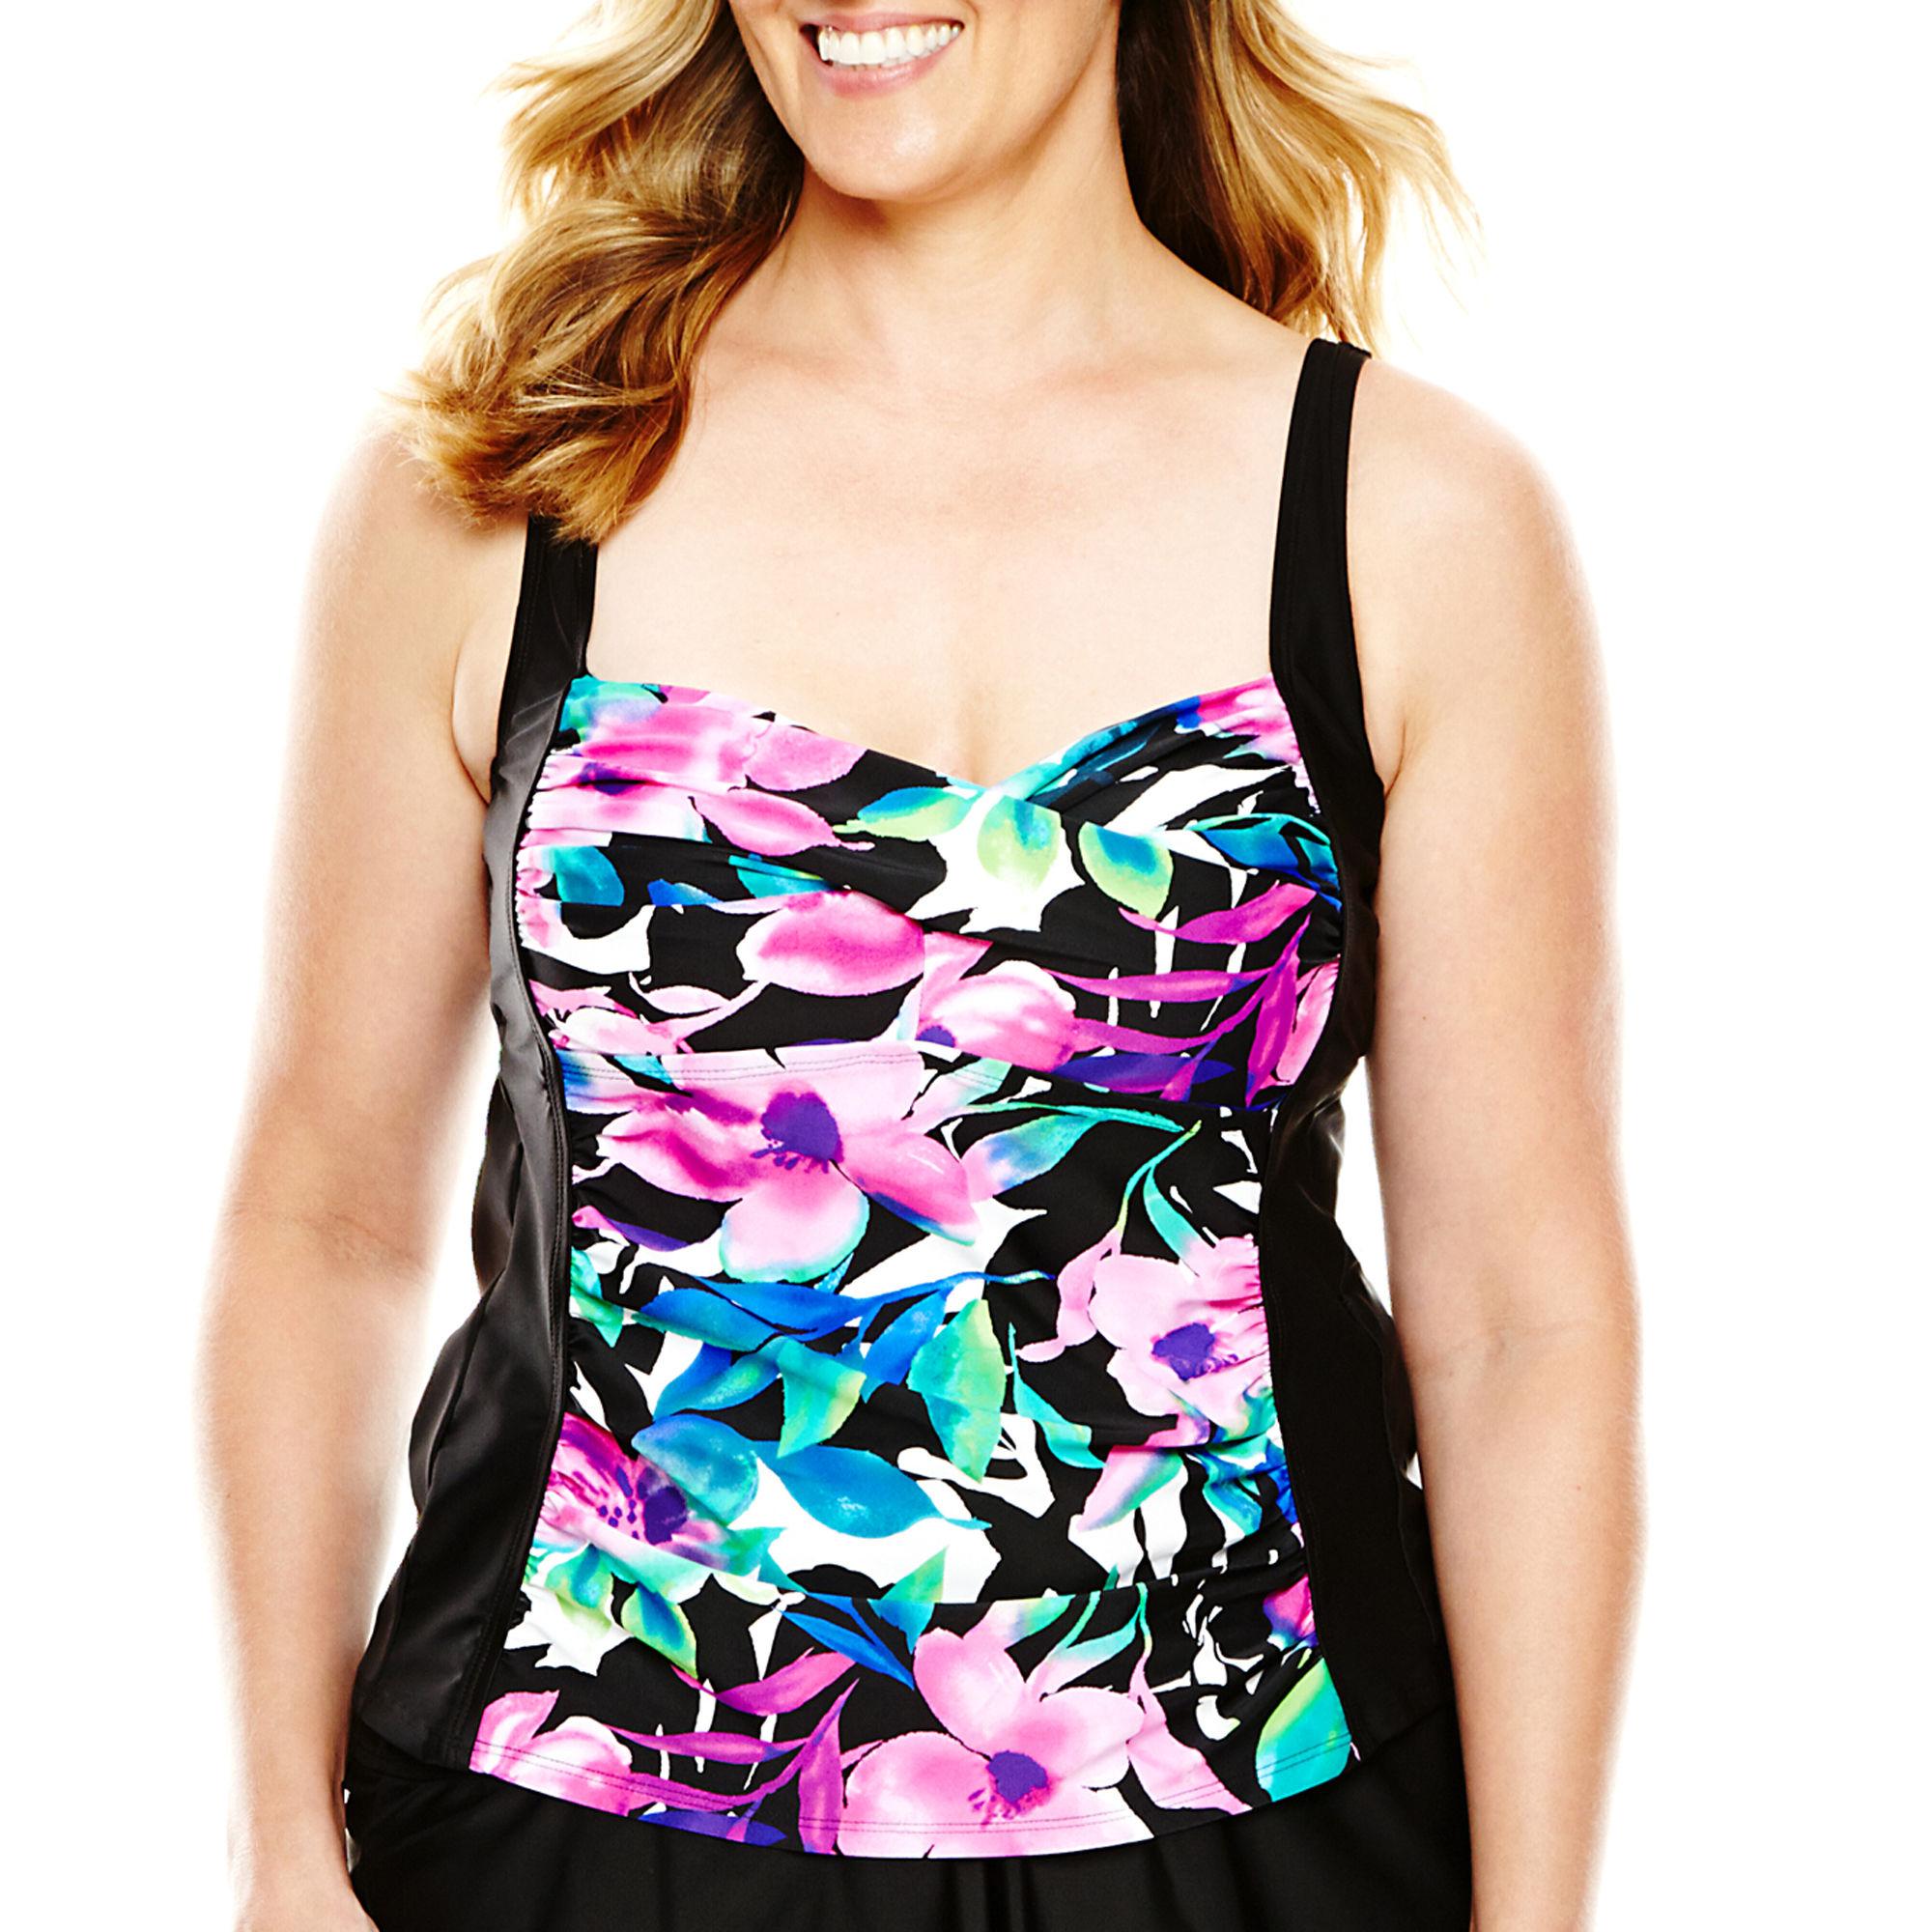 Delta Burke Floral Print Tankini Swim Top - Plus